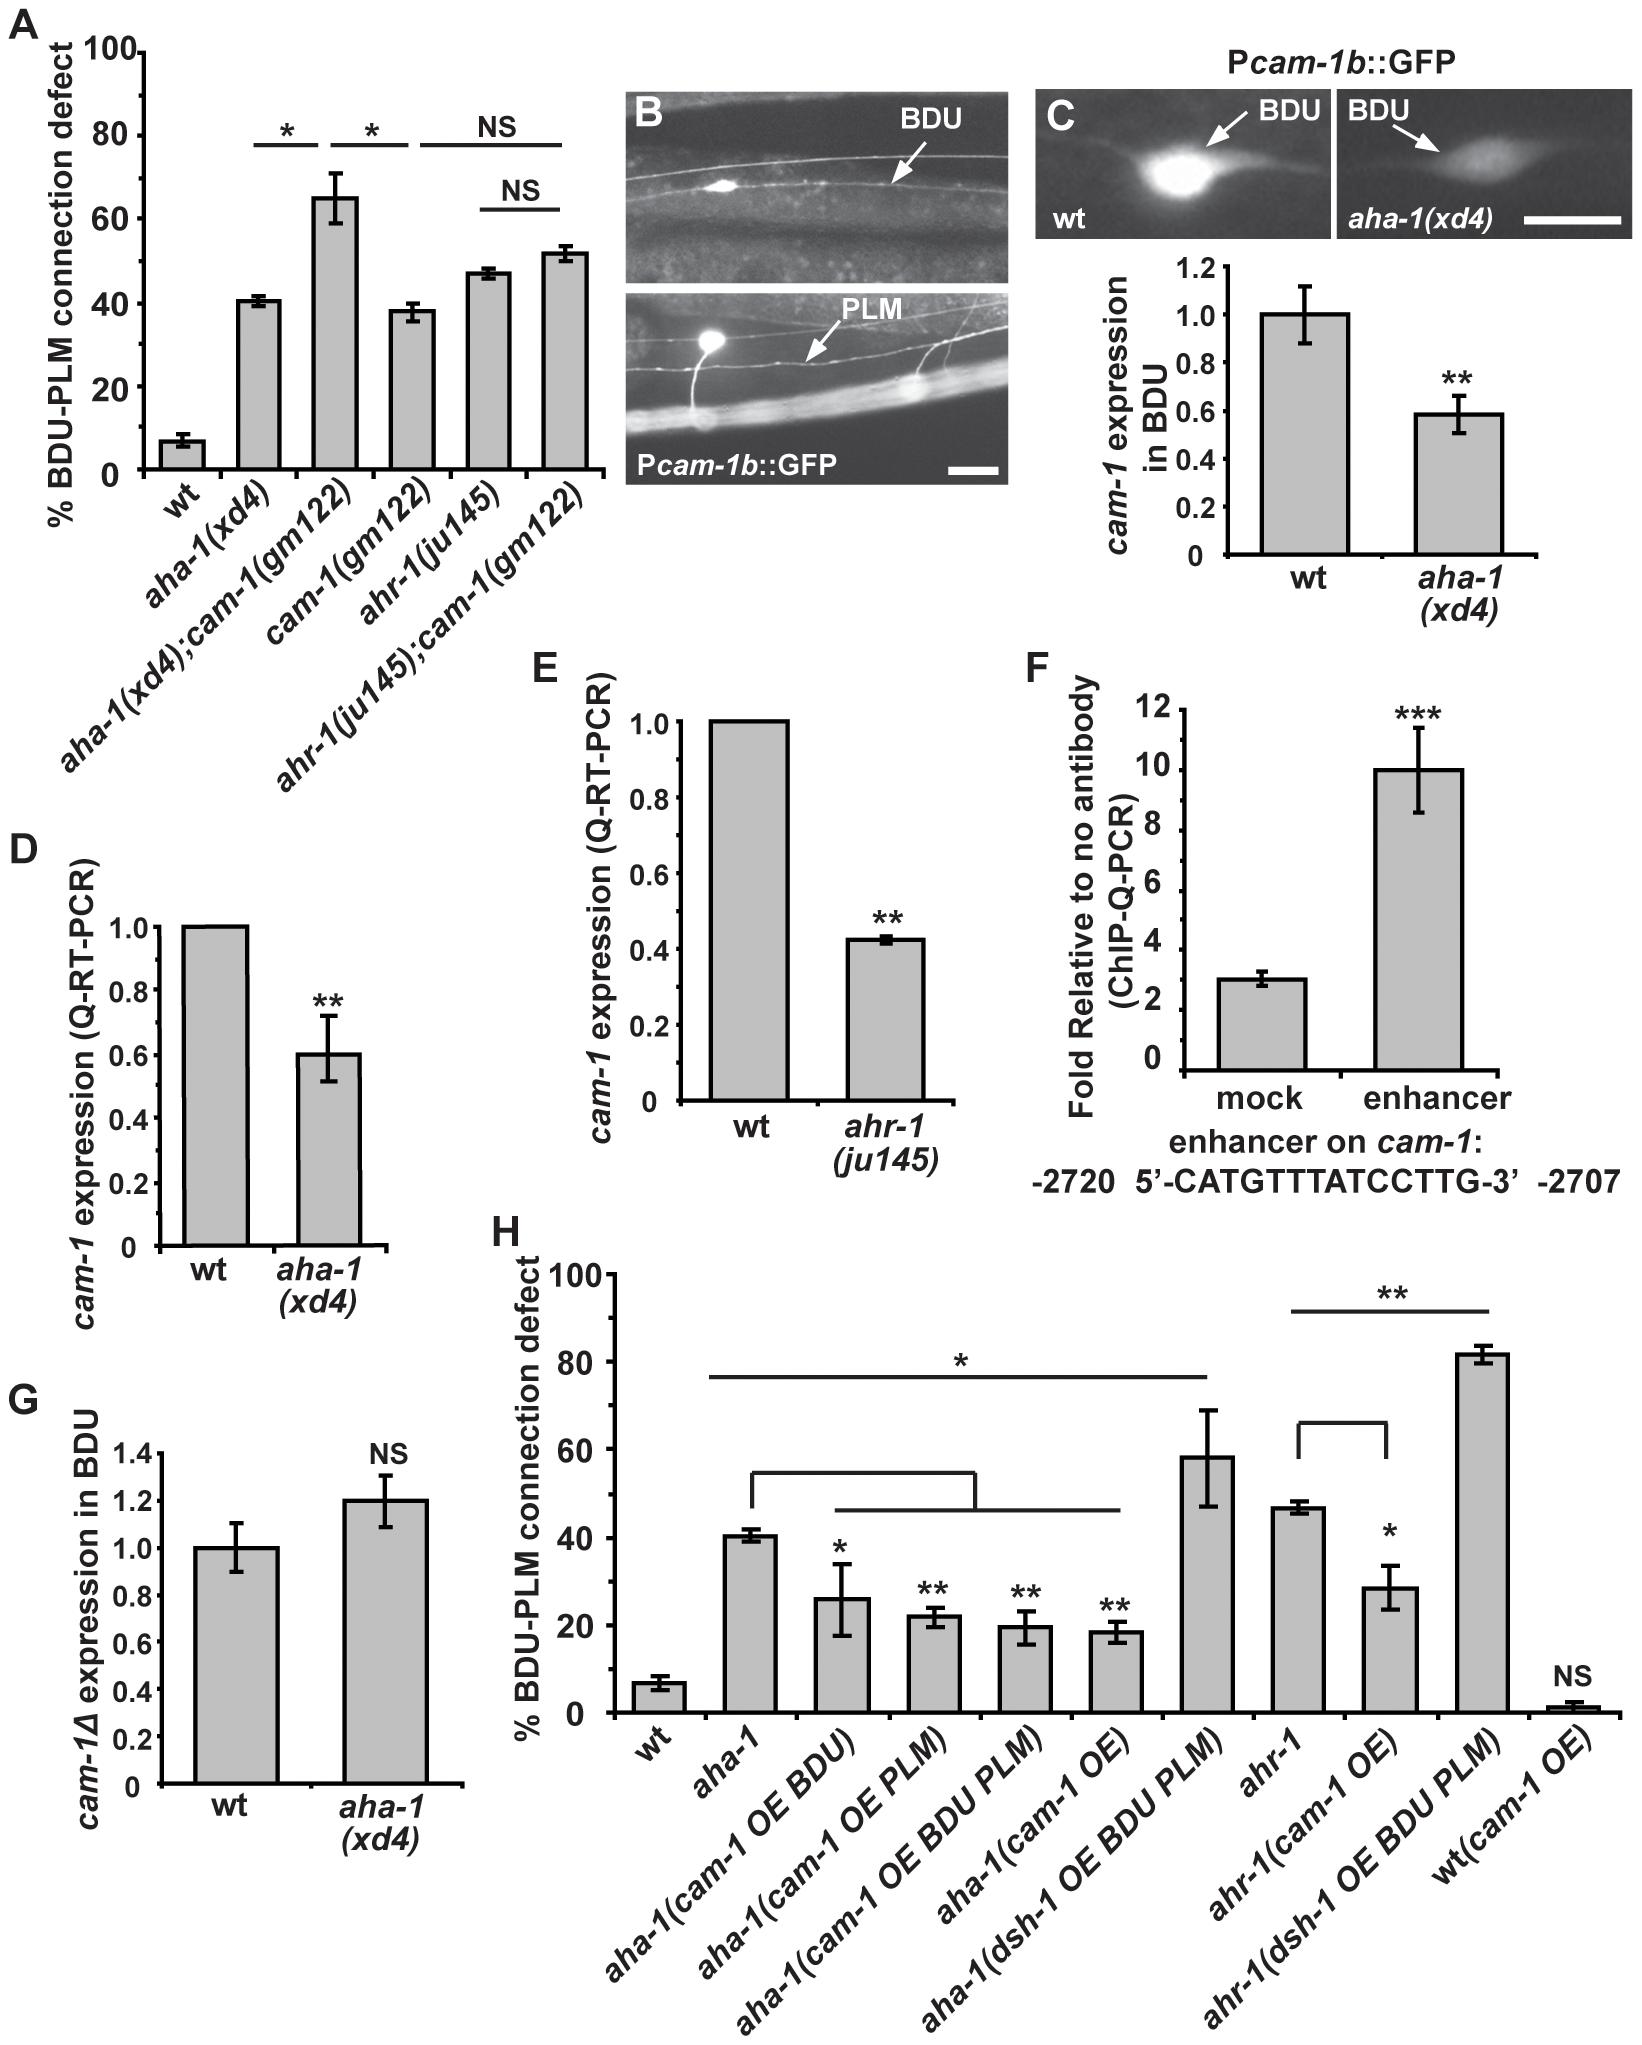 <i>aha-1</i> directly regulates <i>cam-1</i> gene expression.